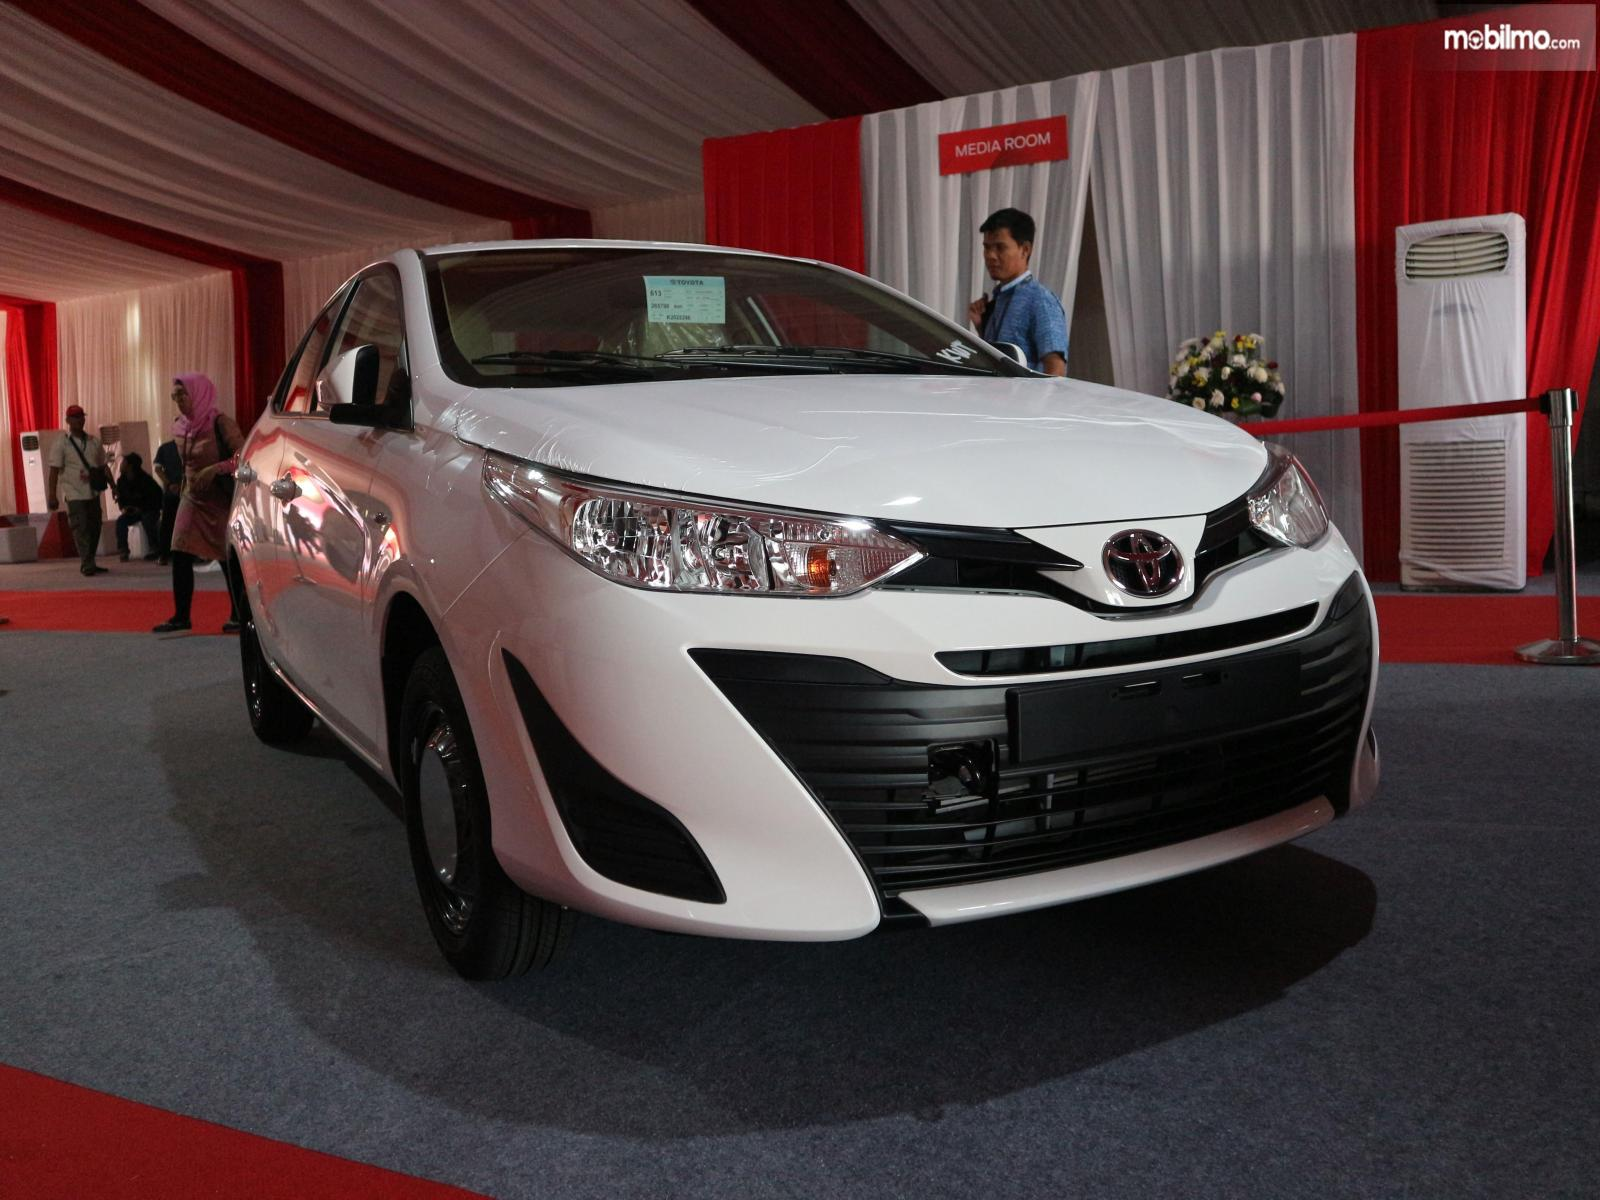 Kelebihan Kekurangan Harga Toyota Vios 2019 Review